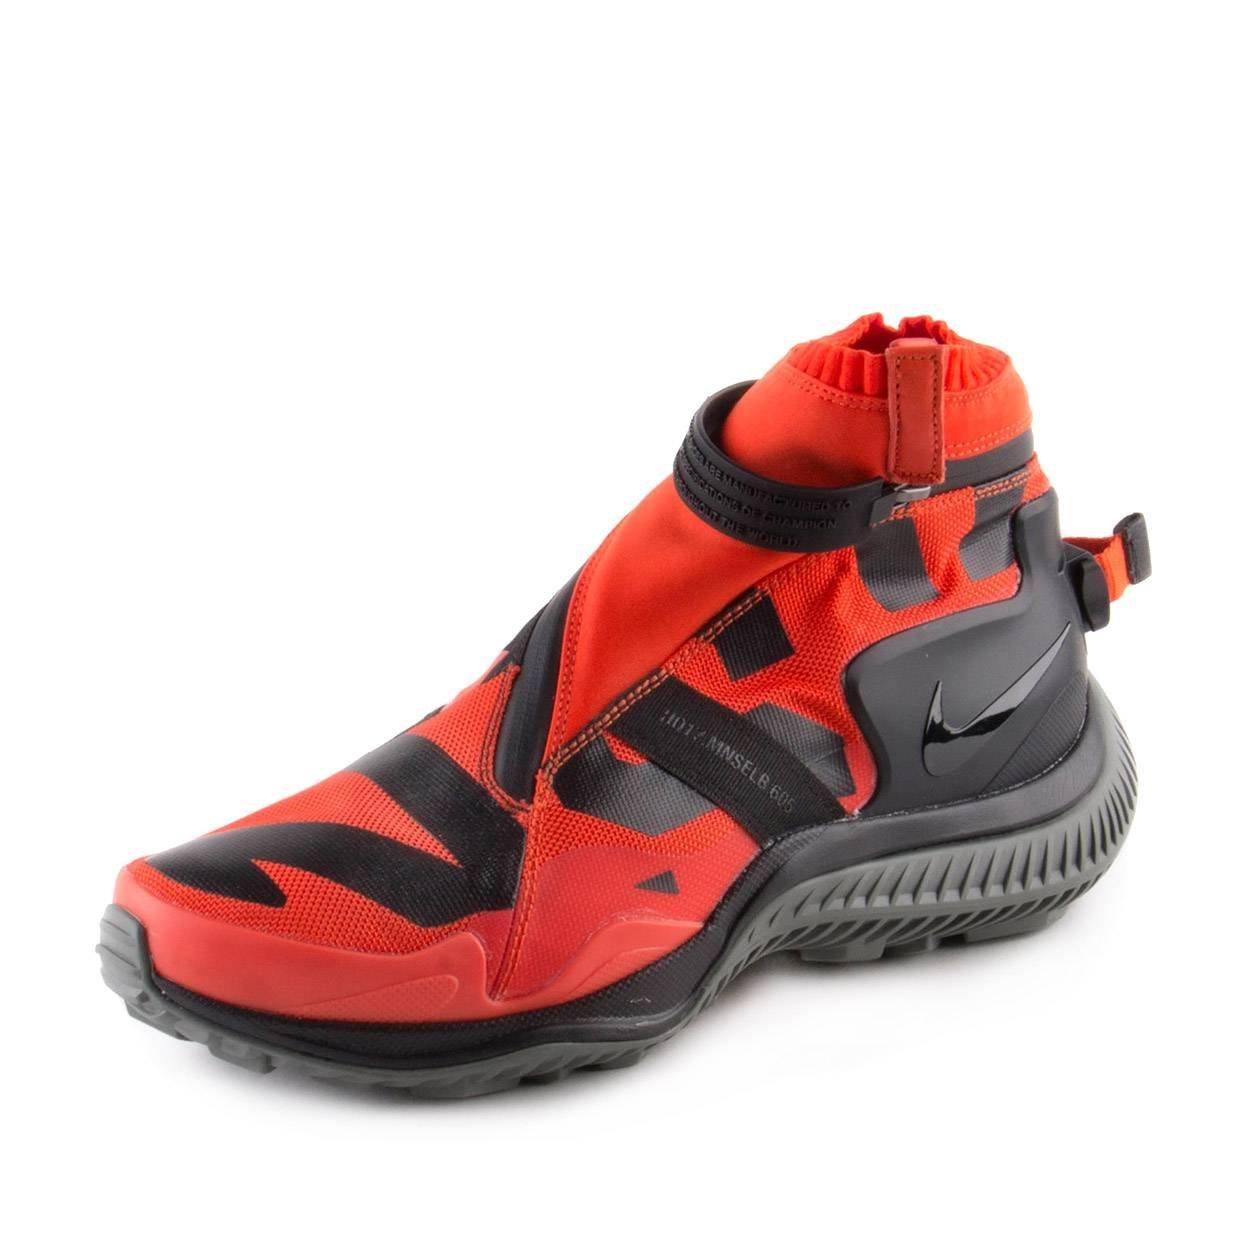 Nike Mens NSW Gaiter Boot Gyakusou Orange/Black Nylon B00FQXRYXW 7 US|Orange/Black